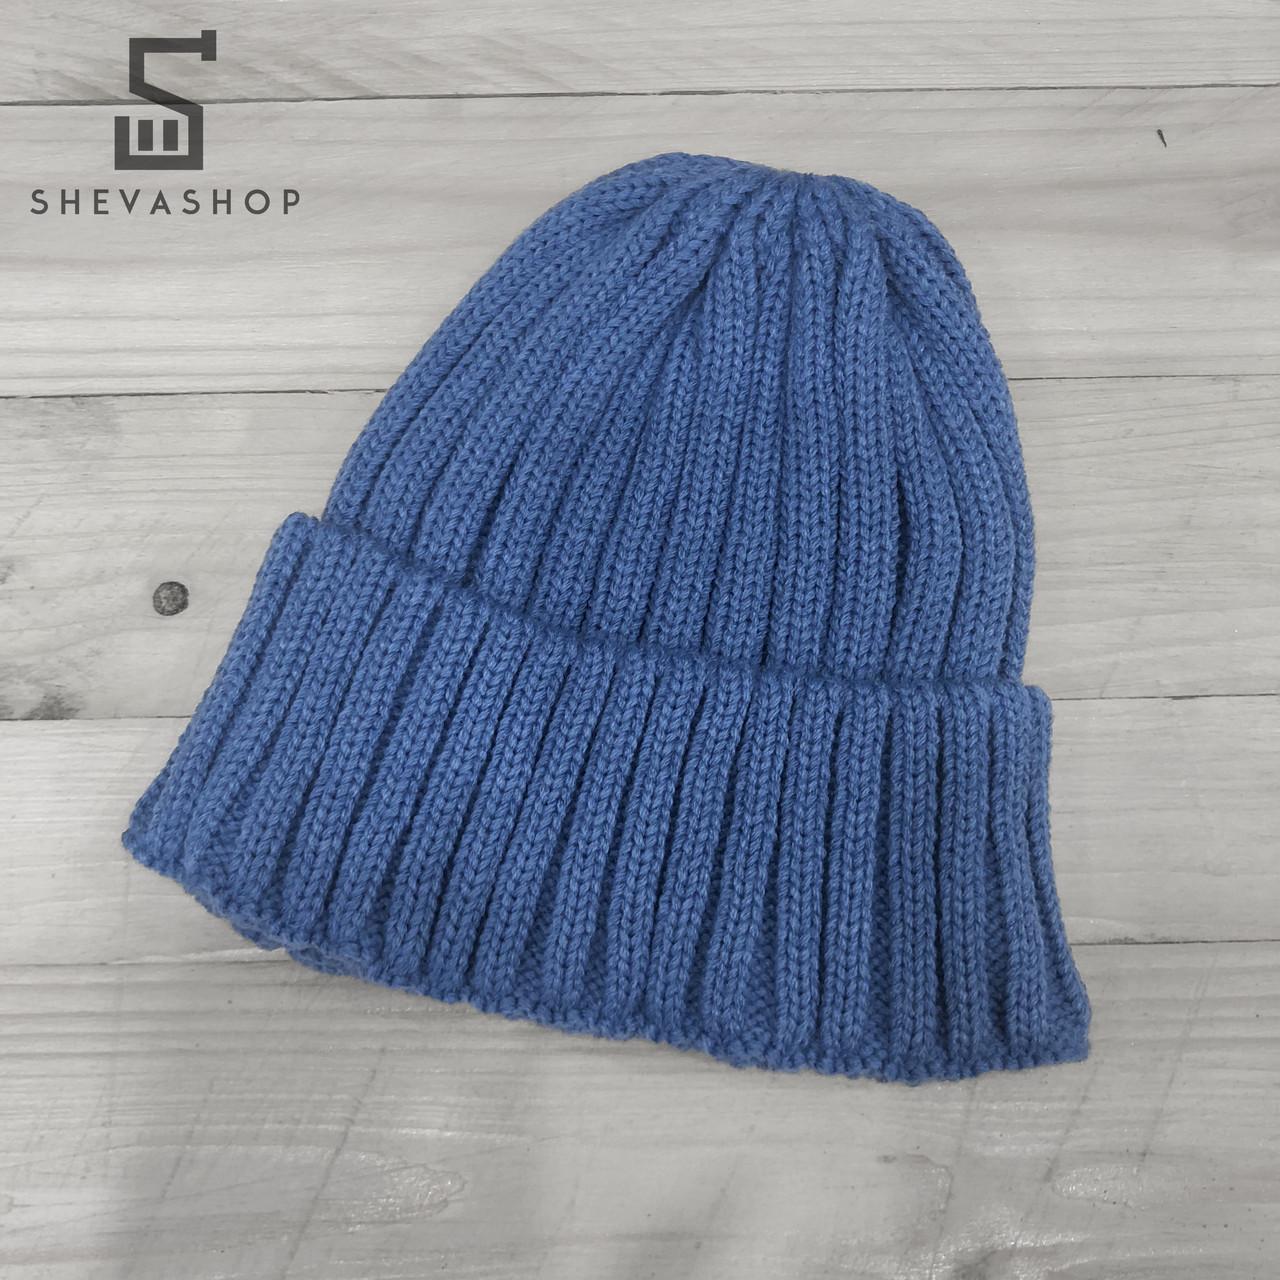 Шапка зимняя KildFol 18.4 унисекс голубая